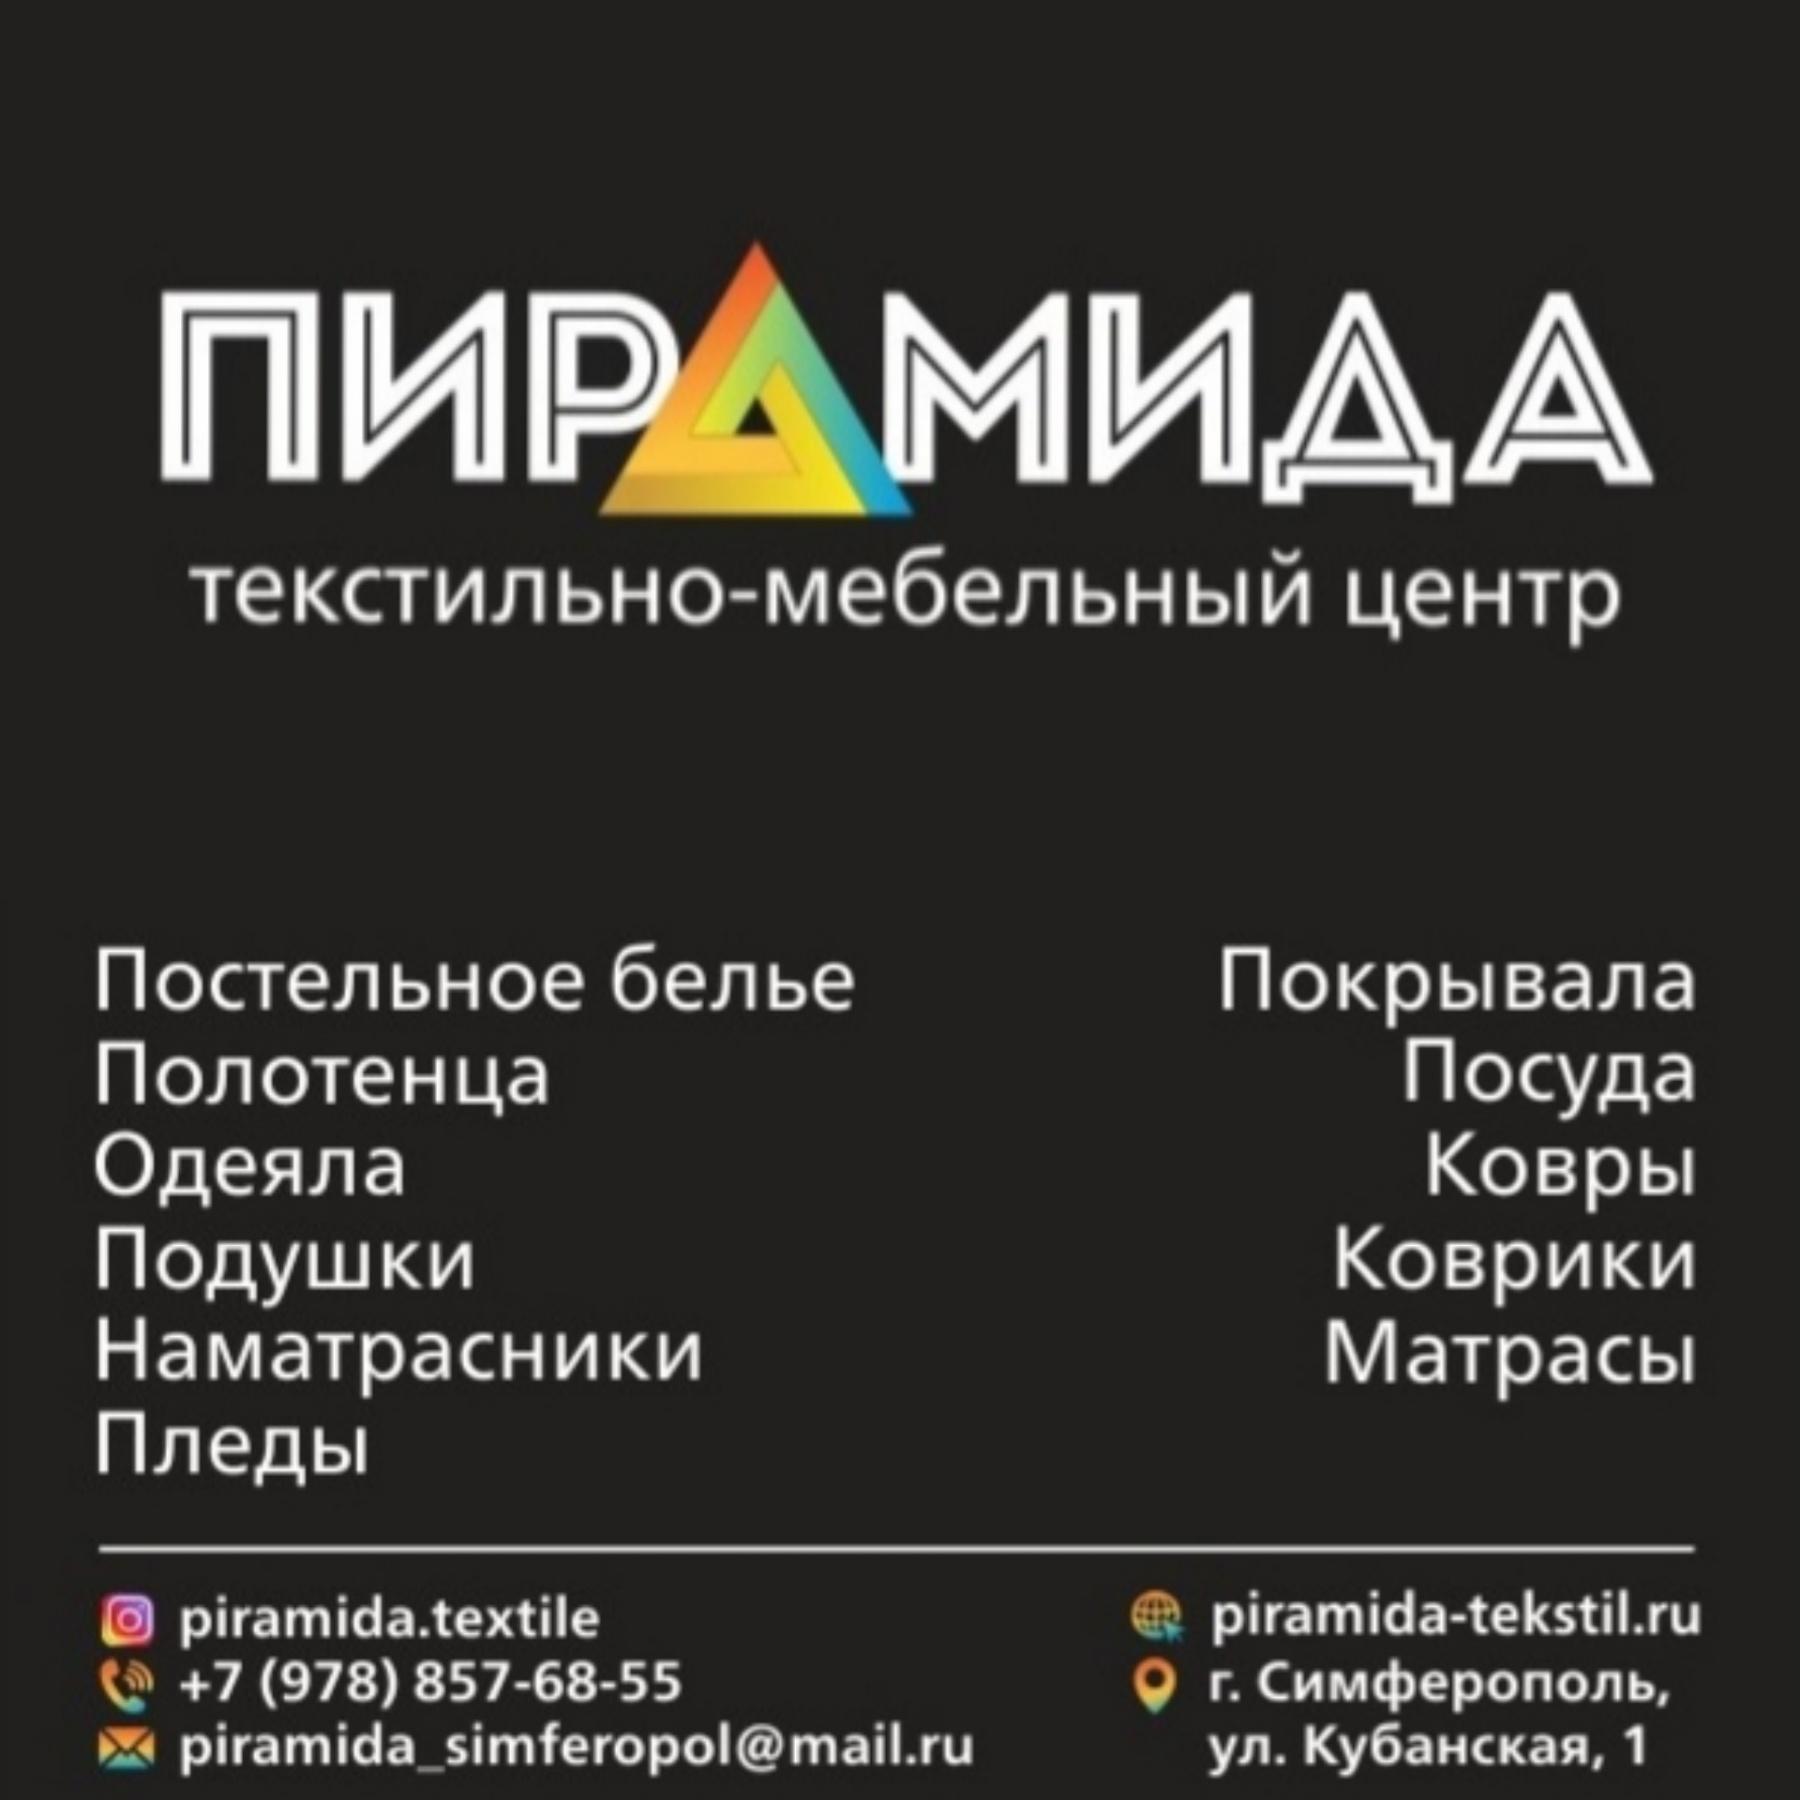 https://piramida-tekstil.ru/